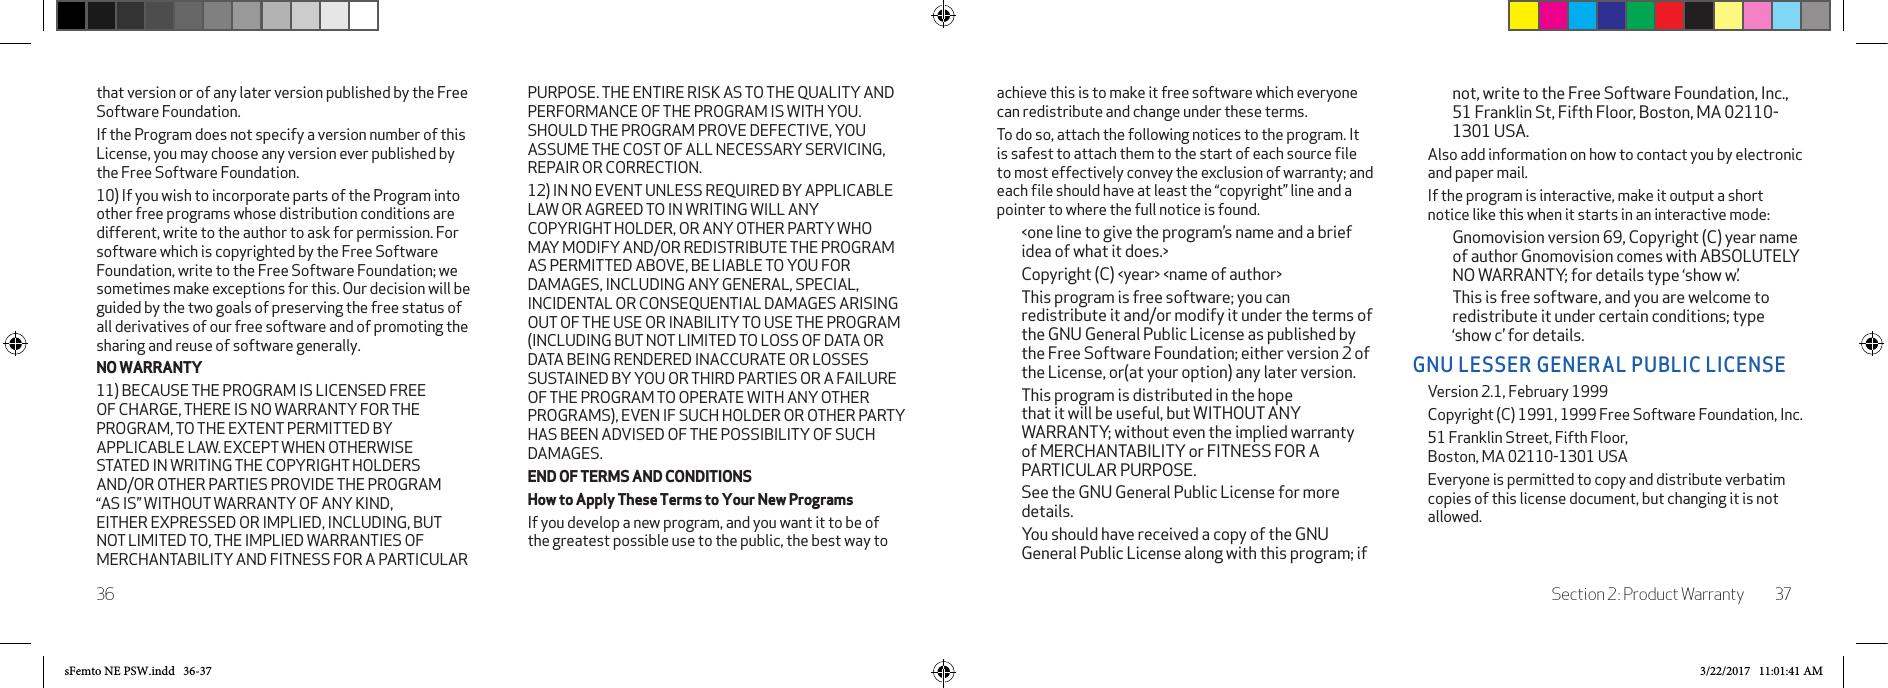 Samsung Electronics Co SLS-BU10B sFemto 2 User Manual ...